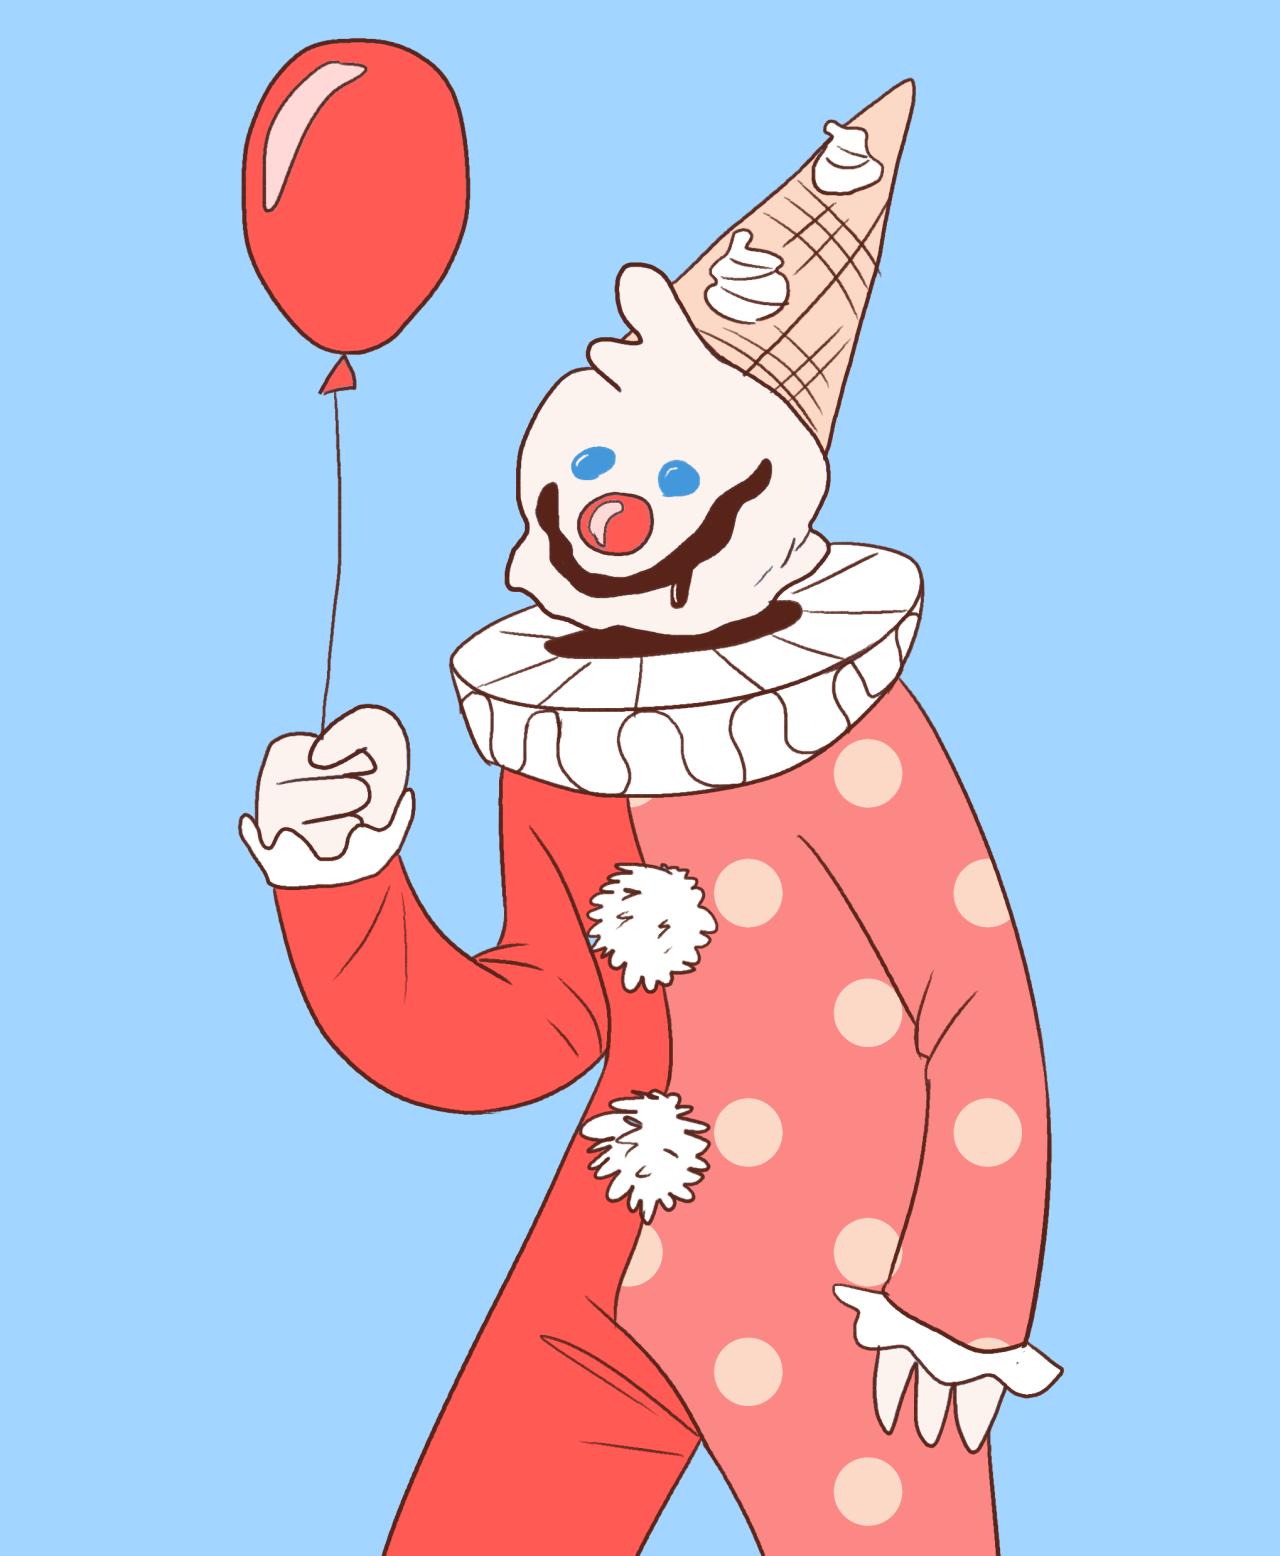 Cute Clown Wallpapers on WallpaperDog